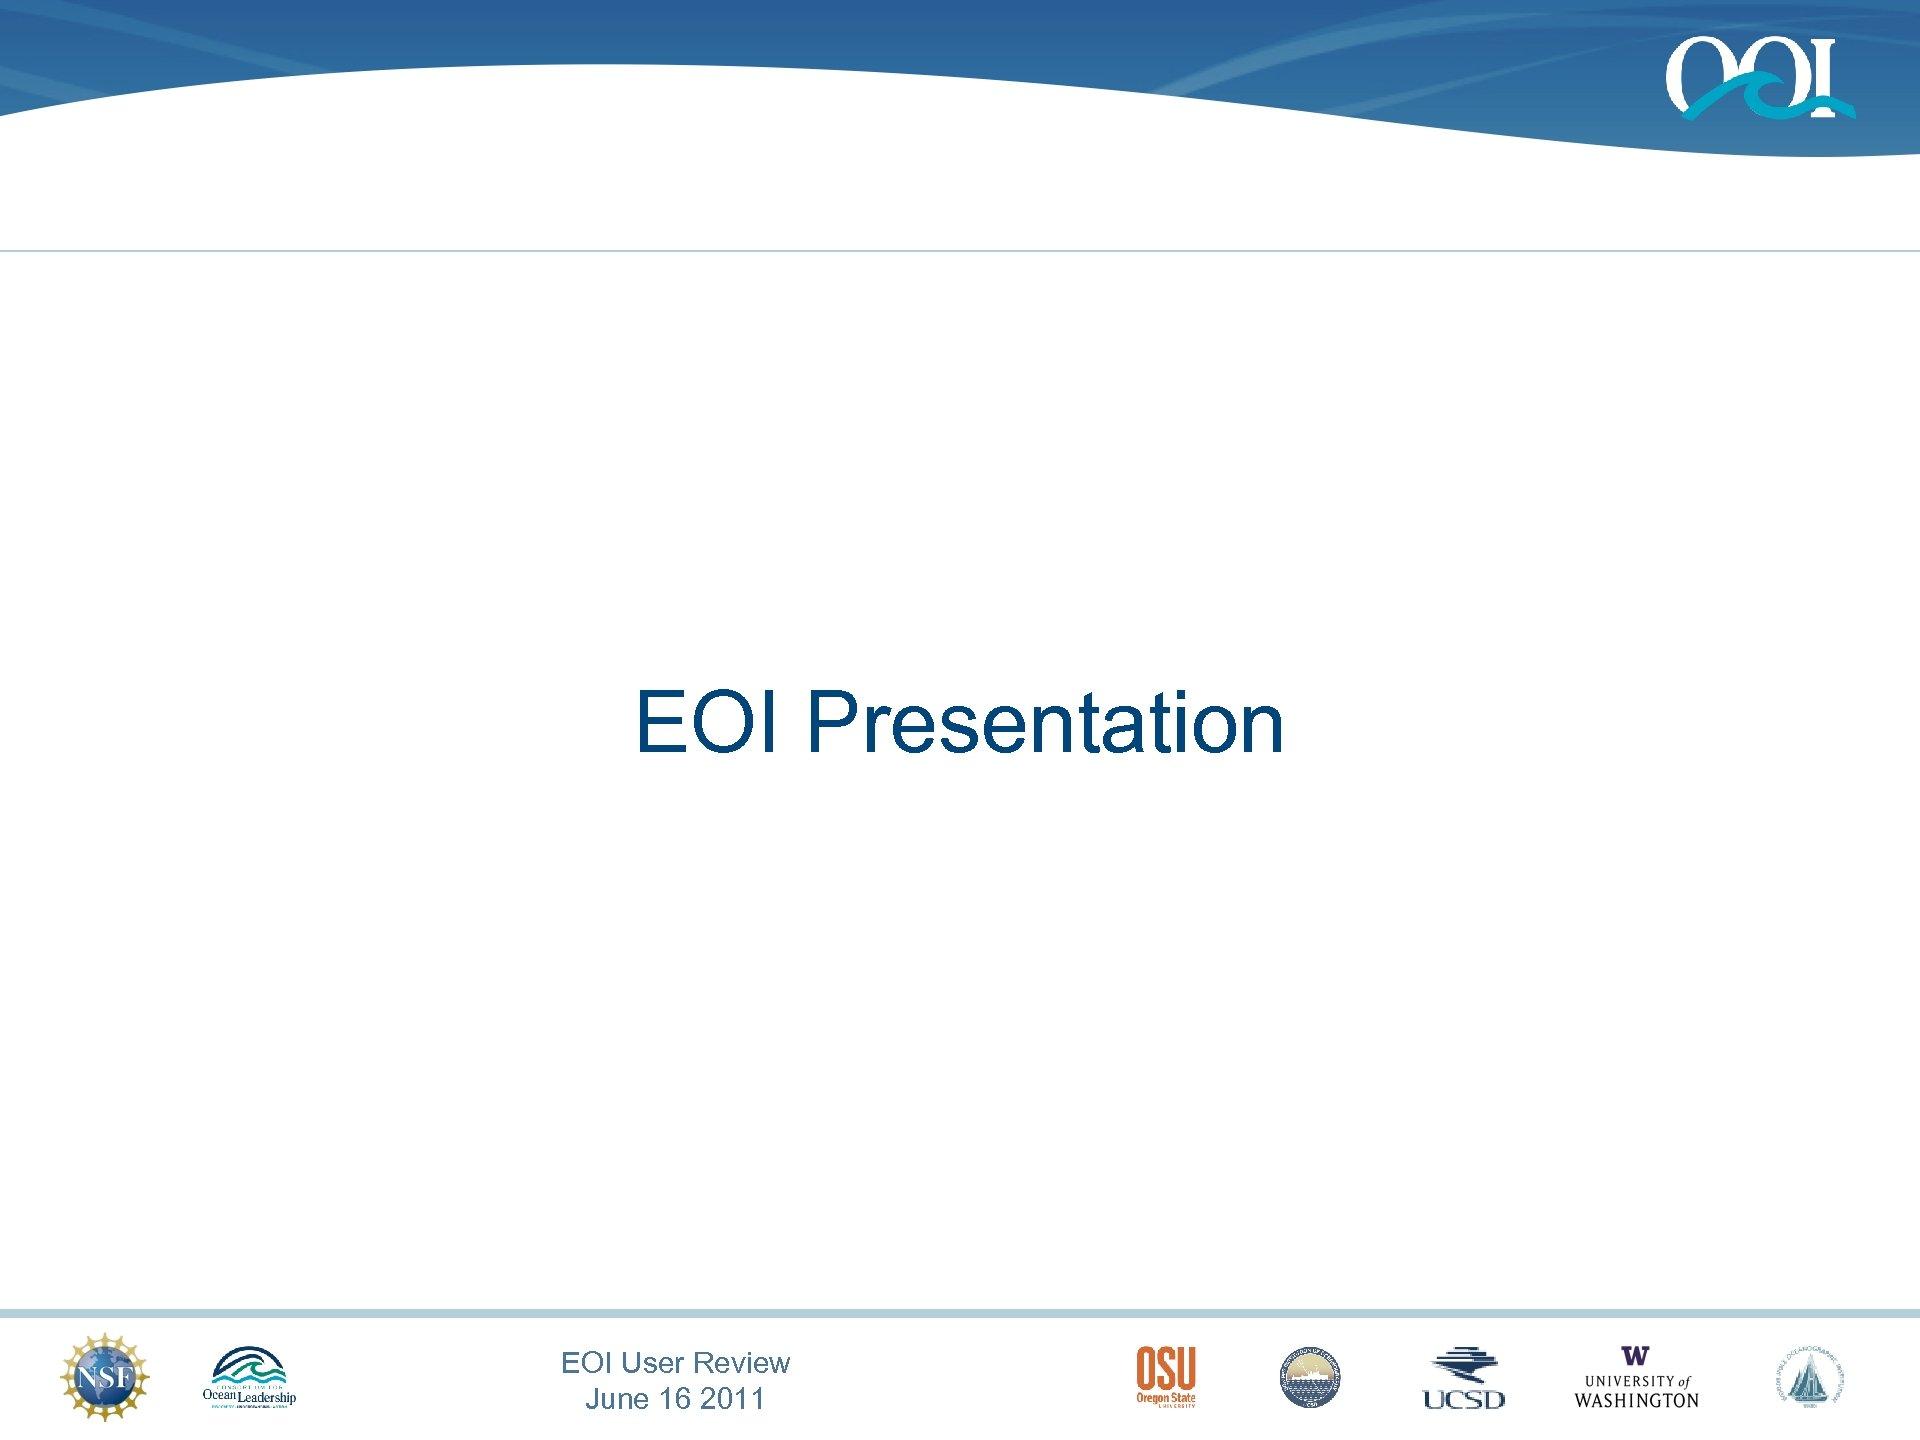 EOI Presentation EOI User Review June 16 2011